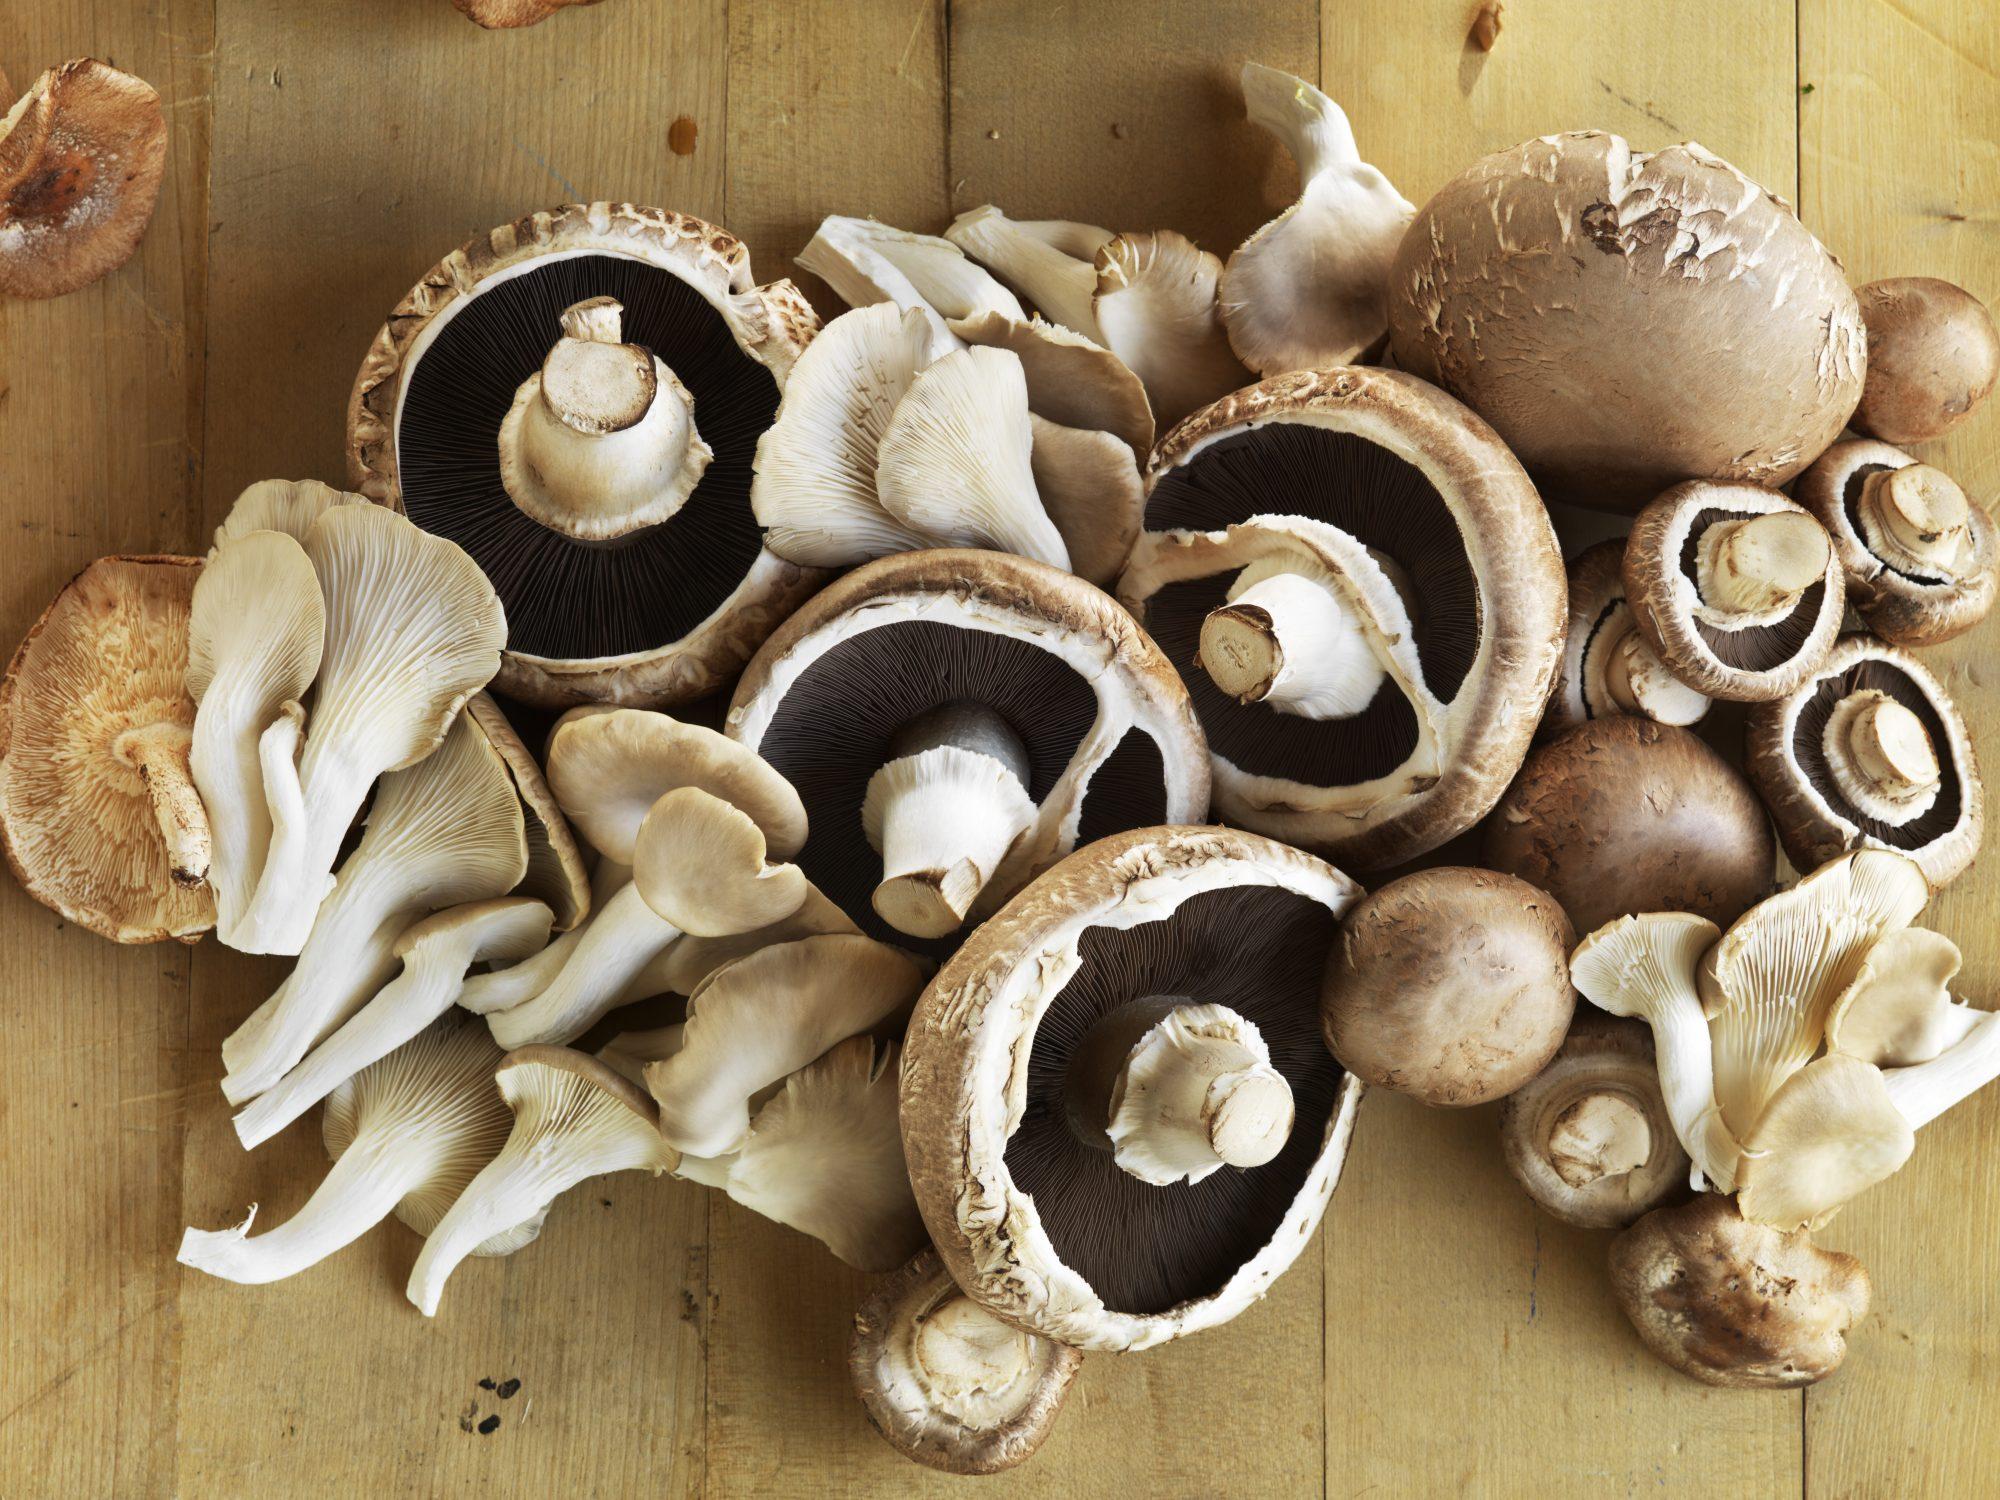 getty-mixed-mushrooms-image